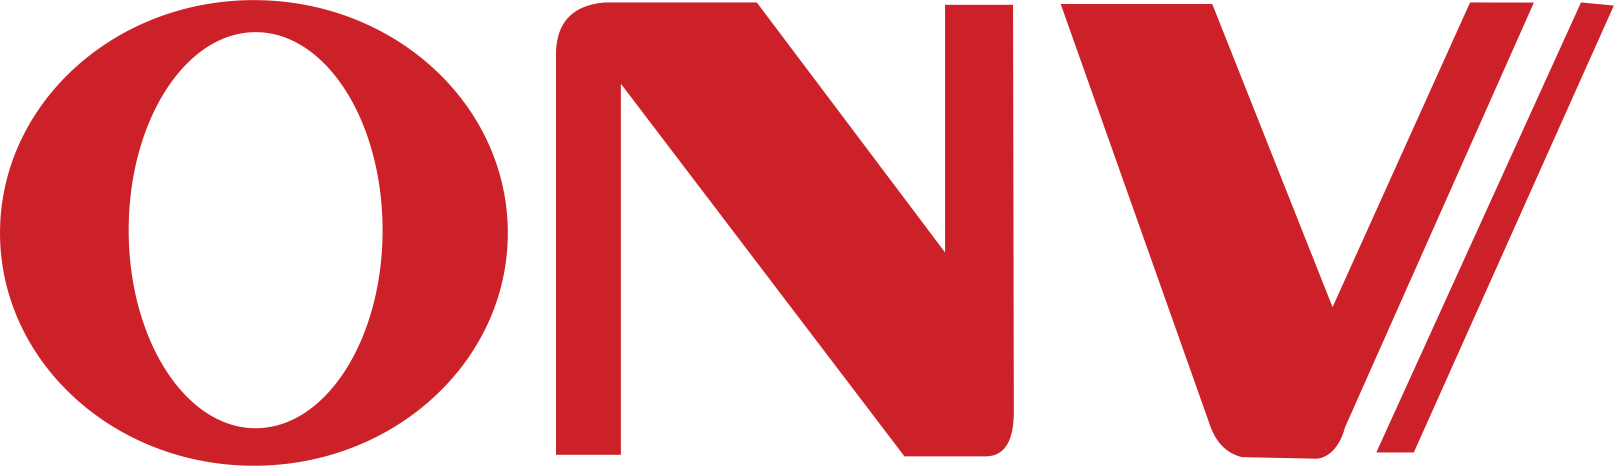 http://bonvancctv.com/product-category/network-equipments/onv/